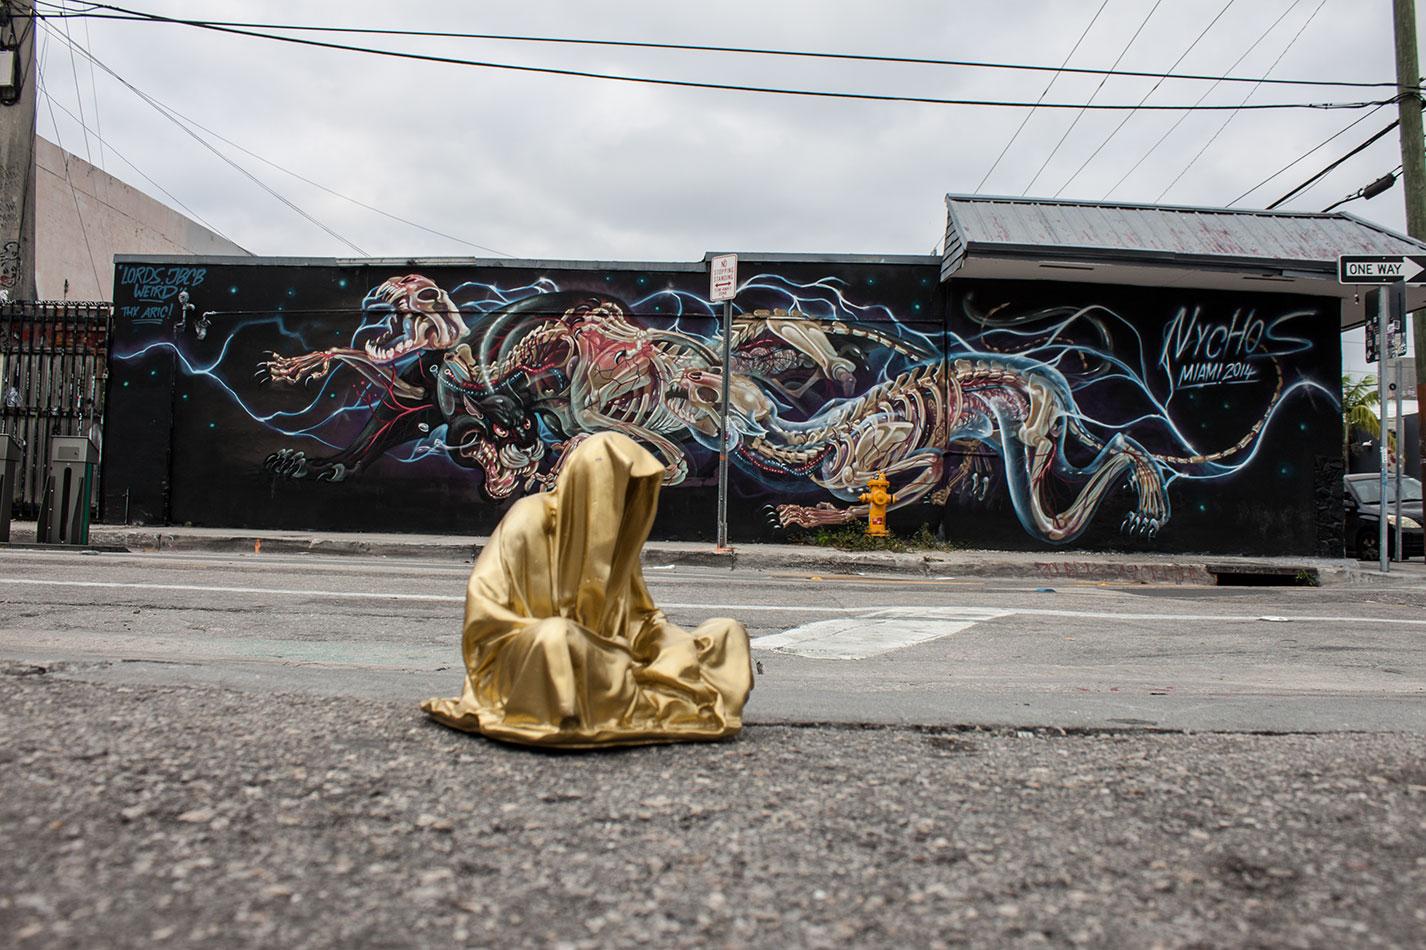 public-art-basel-miami-beach-fair-usa-florida-bass-museum-guardians-of-time-manfred-kili-kielnhofer-contemporary-fine-art-modern-arts-design-antiques-sculpture-6647